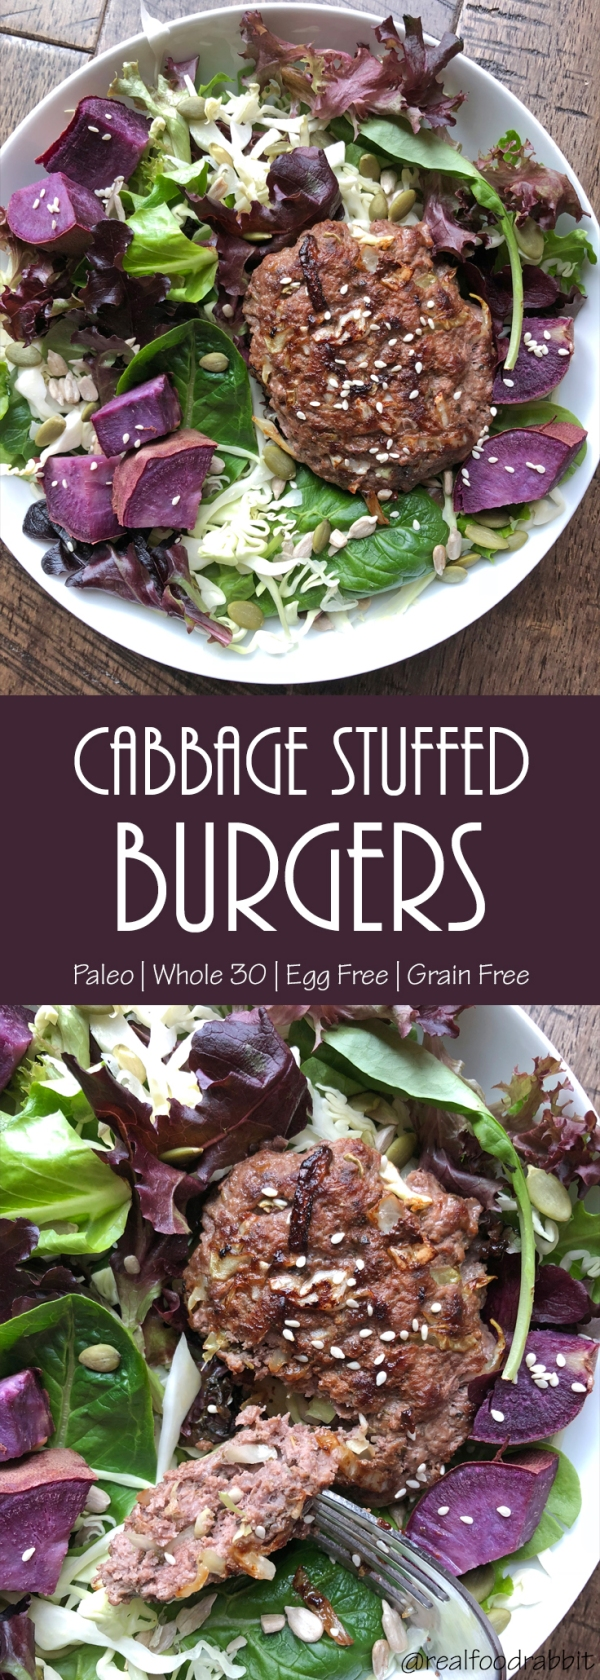 cabbage stuffed burgers.jpg